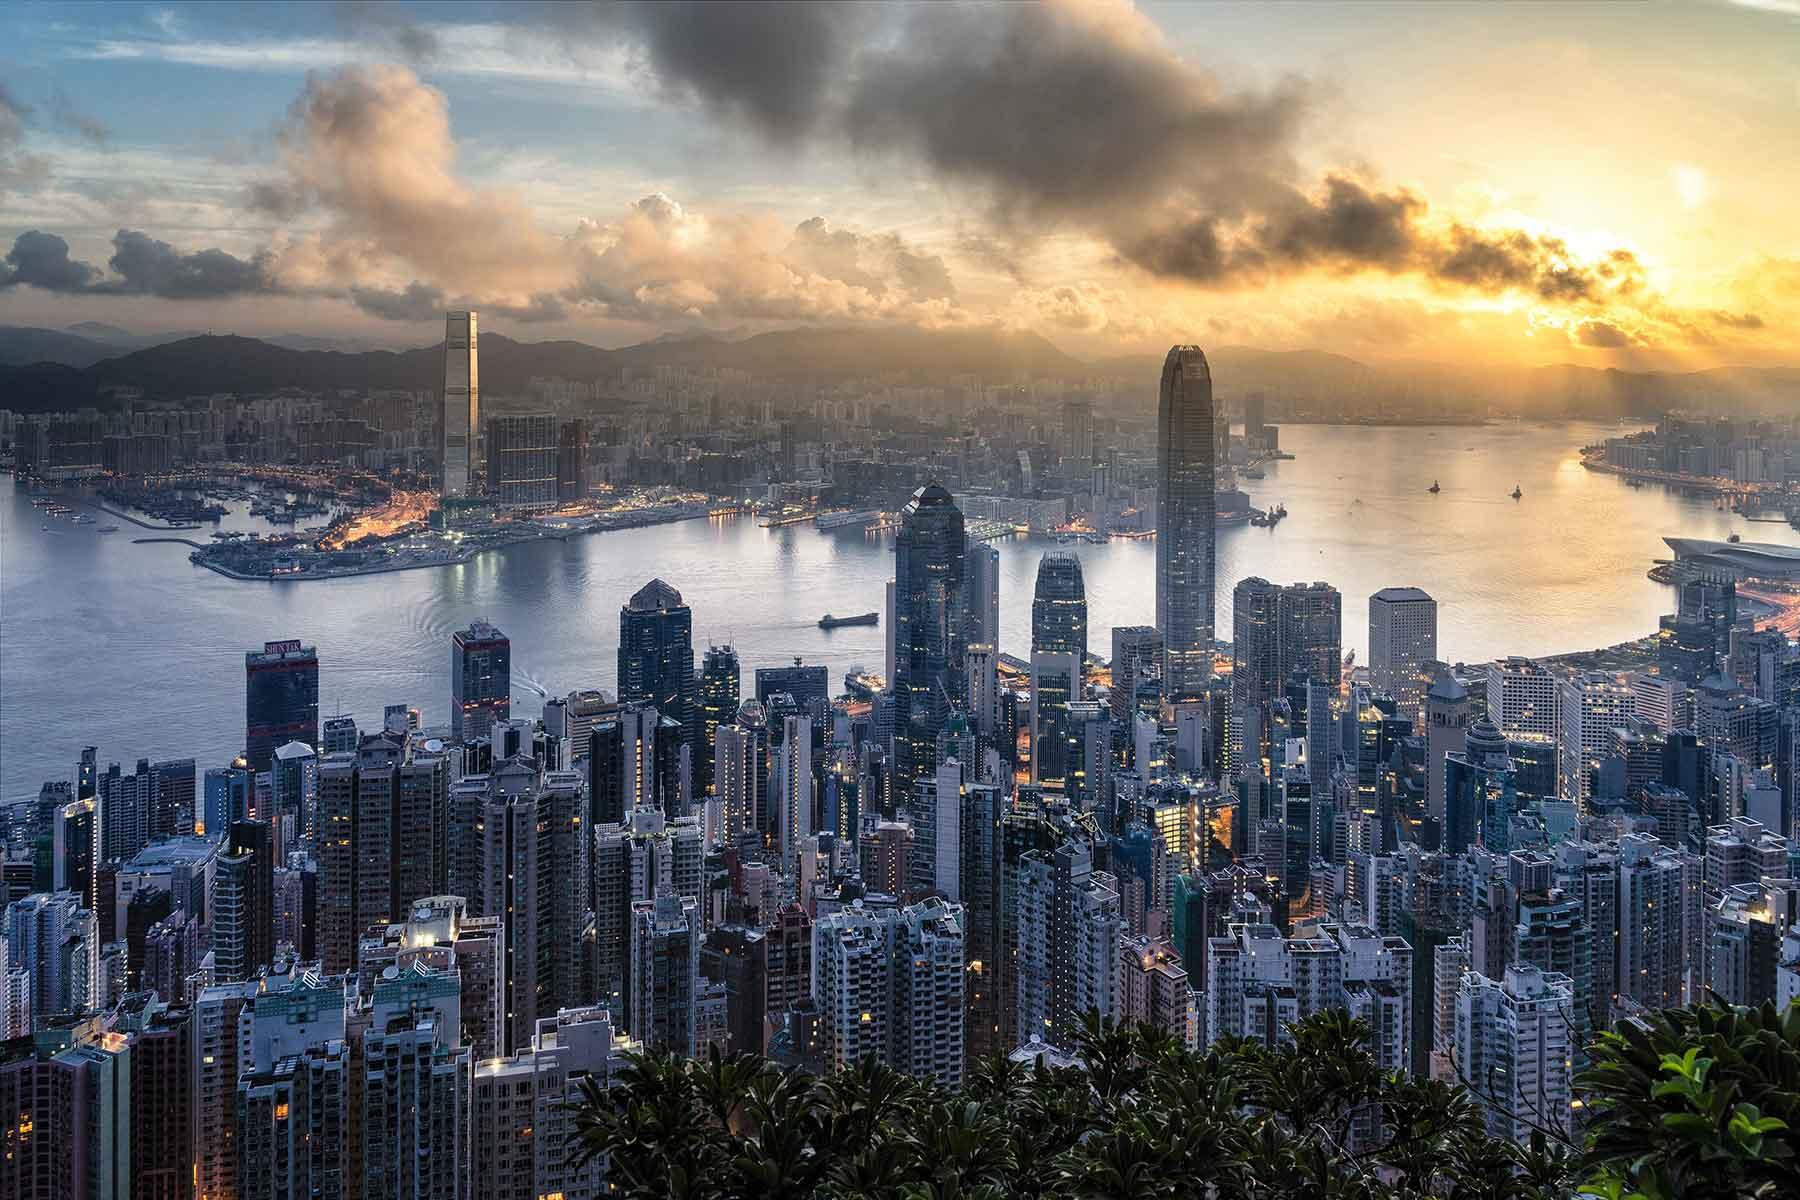 Resor-till-Hong-Kong-med-Nygren-&-Lind-Resebyrå--kväll